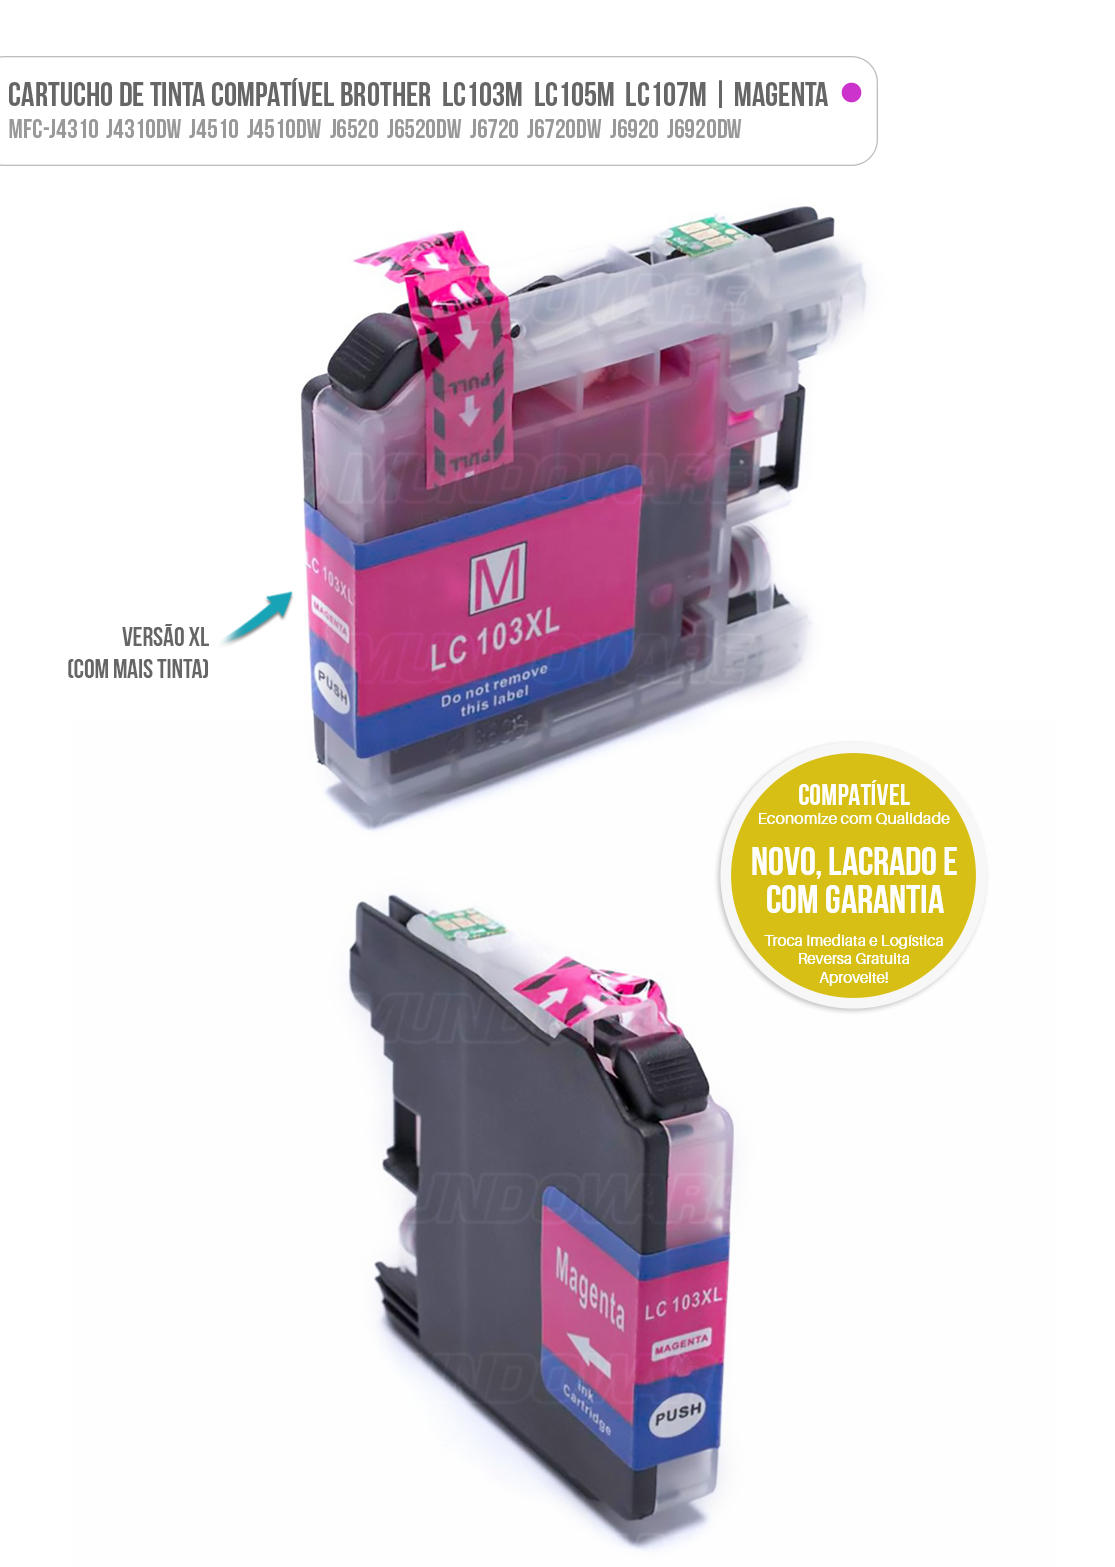 Cartucho de Tinta Compatível LC103 LC105 LC107 XL para Brother MFC-J4510 J4710DW J6520 J6720DW J6920DW Magenta